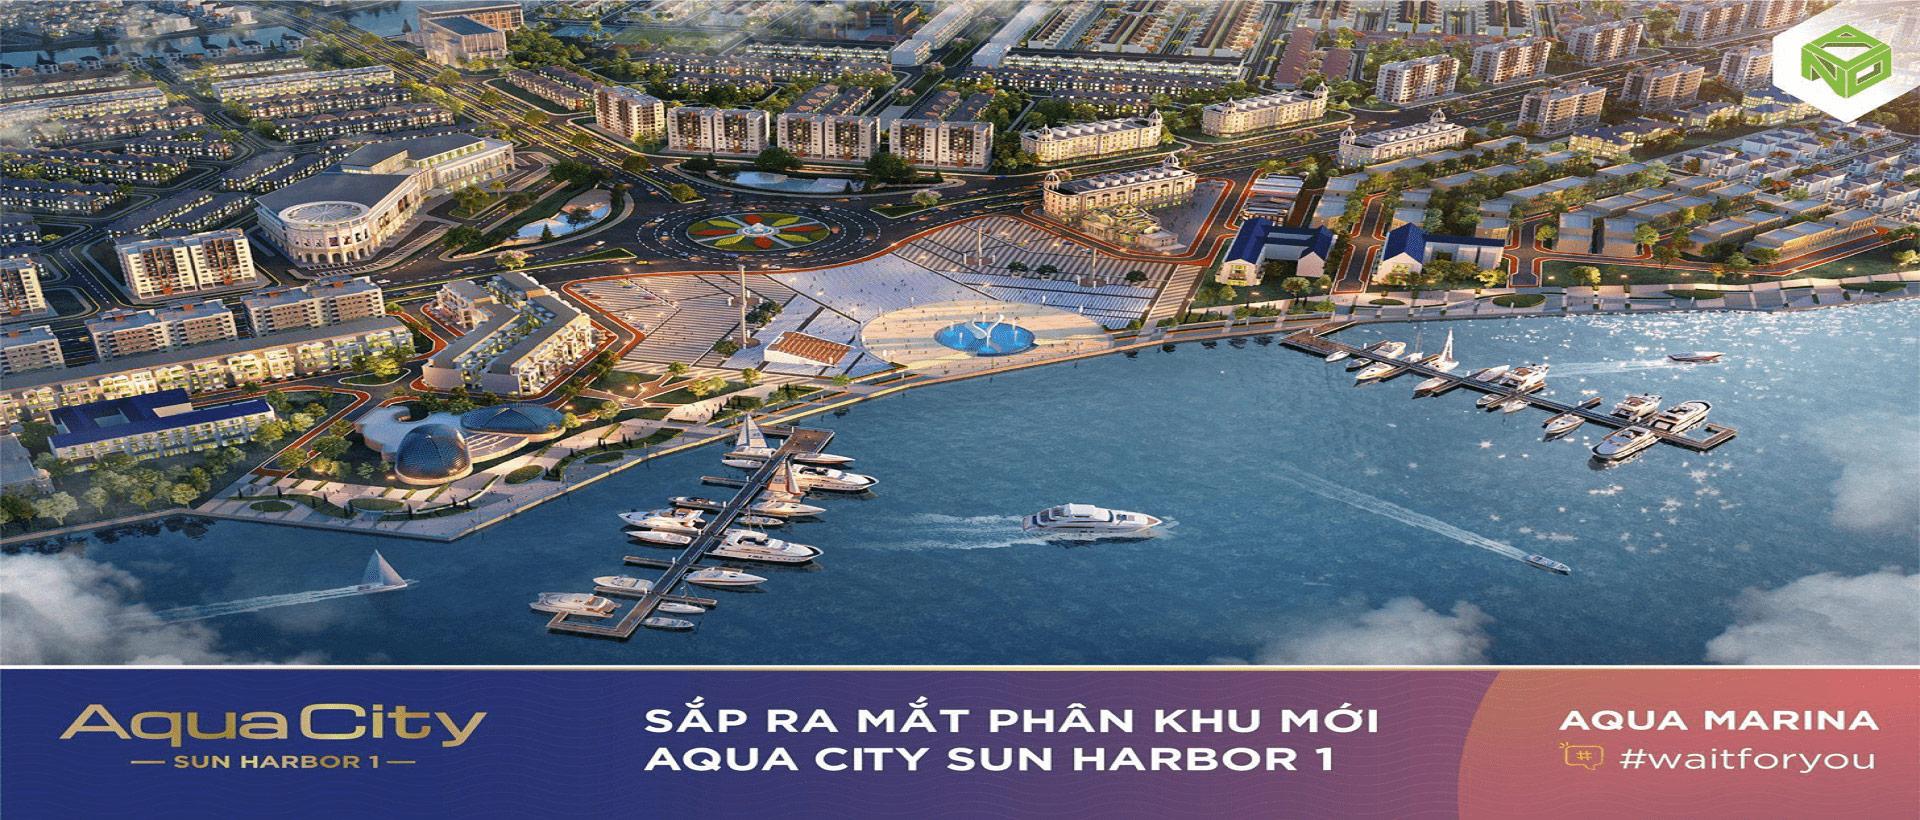 SUN HABOR 1 AQUA CITY ĐỒNG NAI